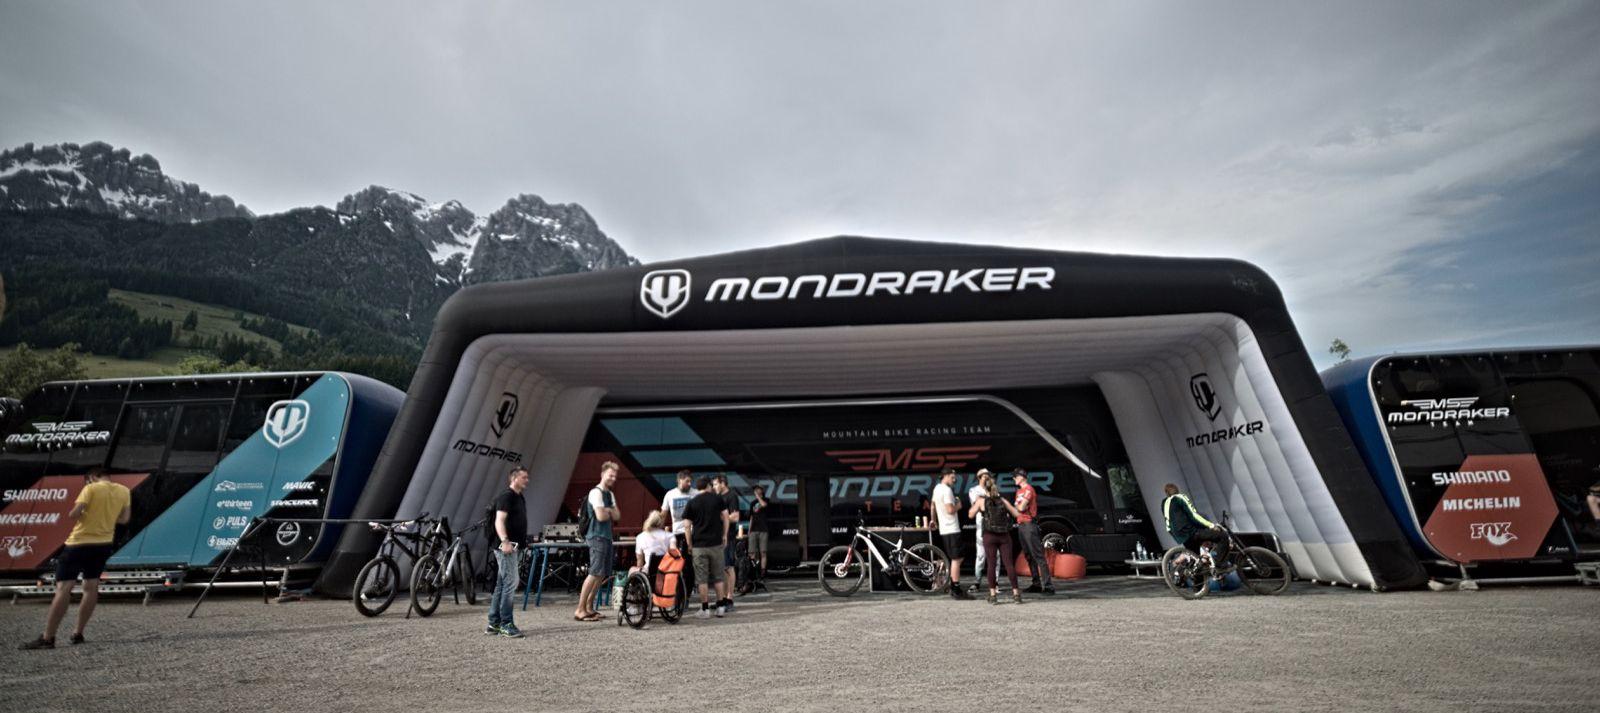 Mondraker-Bikes-Mexico-World-Cup-DH-UCI